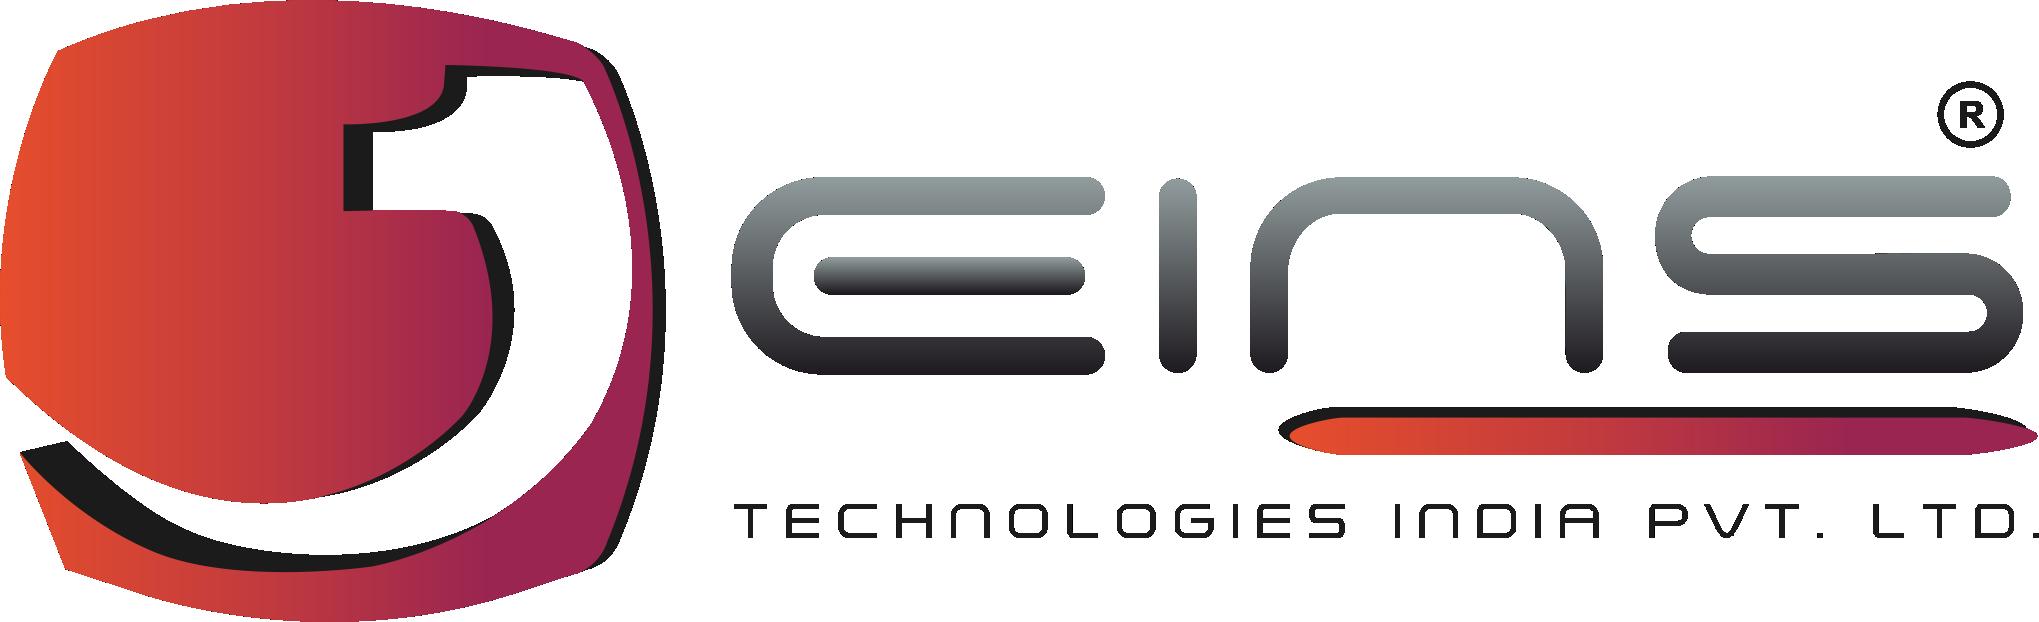 EINS TECHNOLOGIES INDIA PVT. LTD.